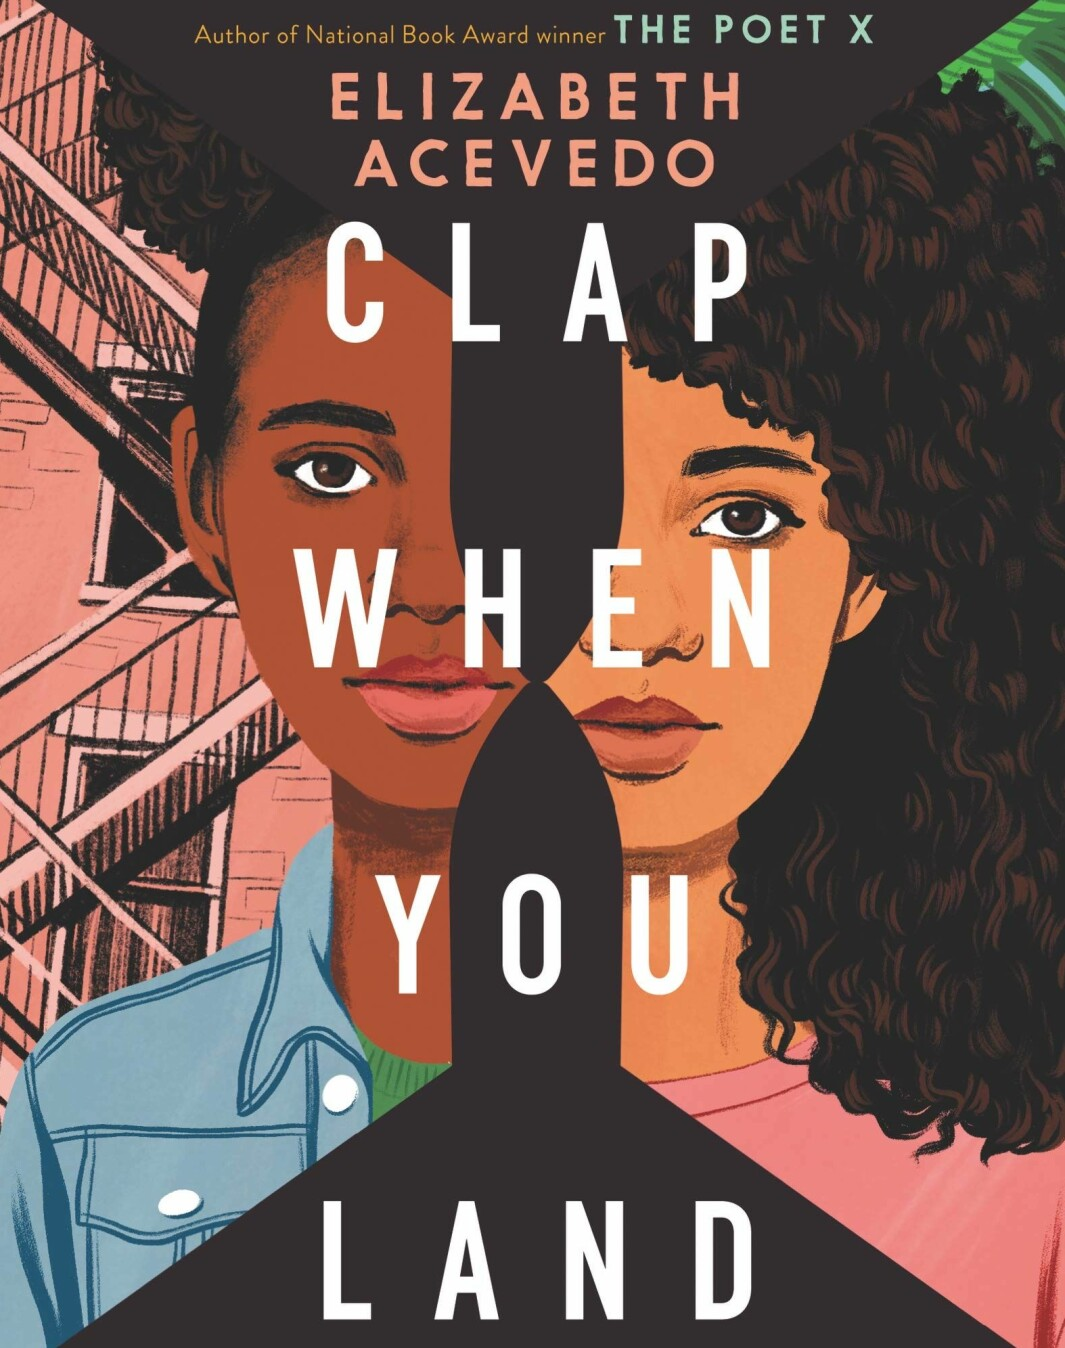 Clap When You Land, Elizabeth Acevedo. Quill Tree Books, 433 sider. Lydbok fra Harper audio, 5 timer.